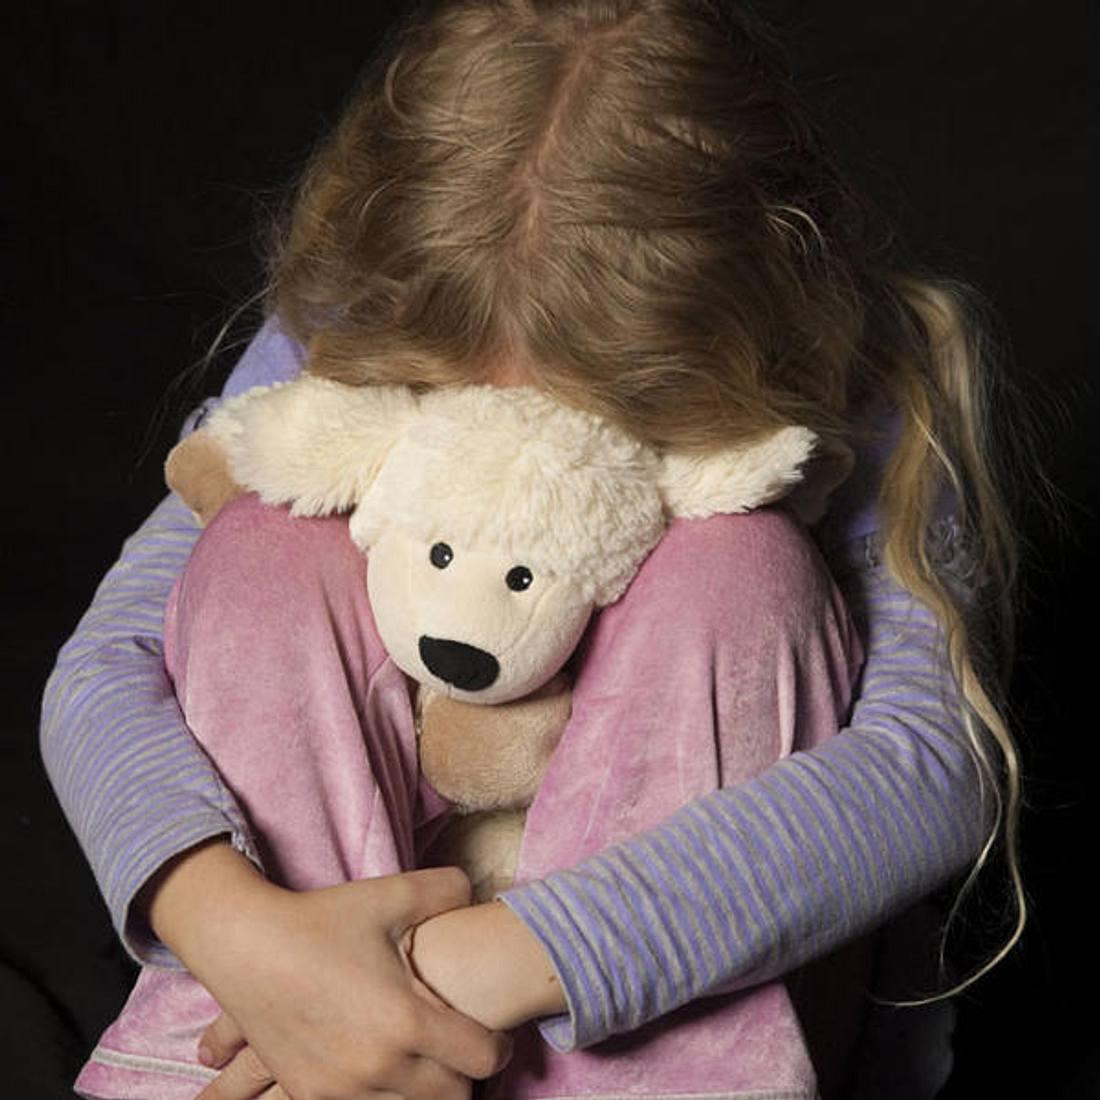 Man missbraucht Stieftochter (Symbolbild)